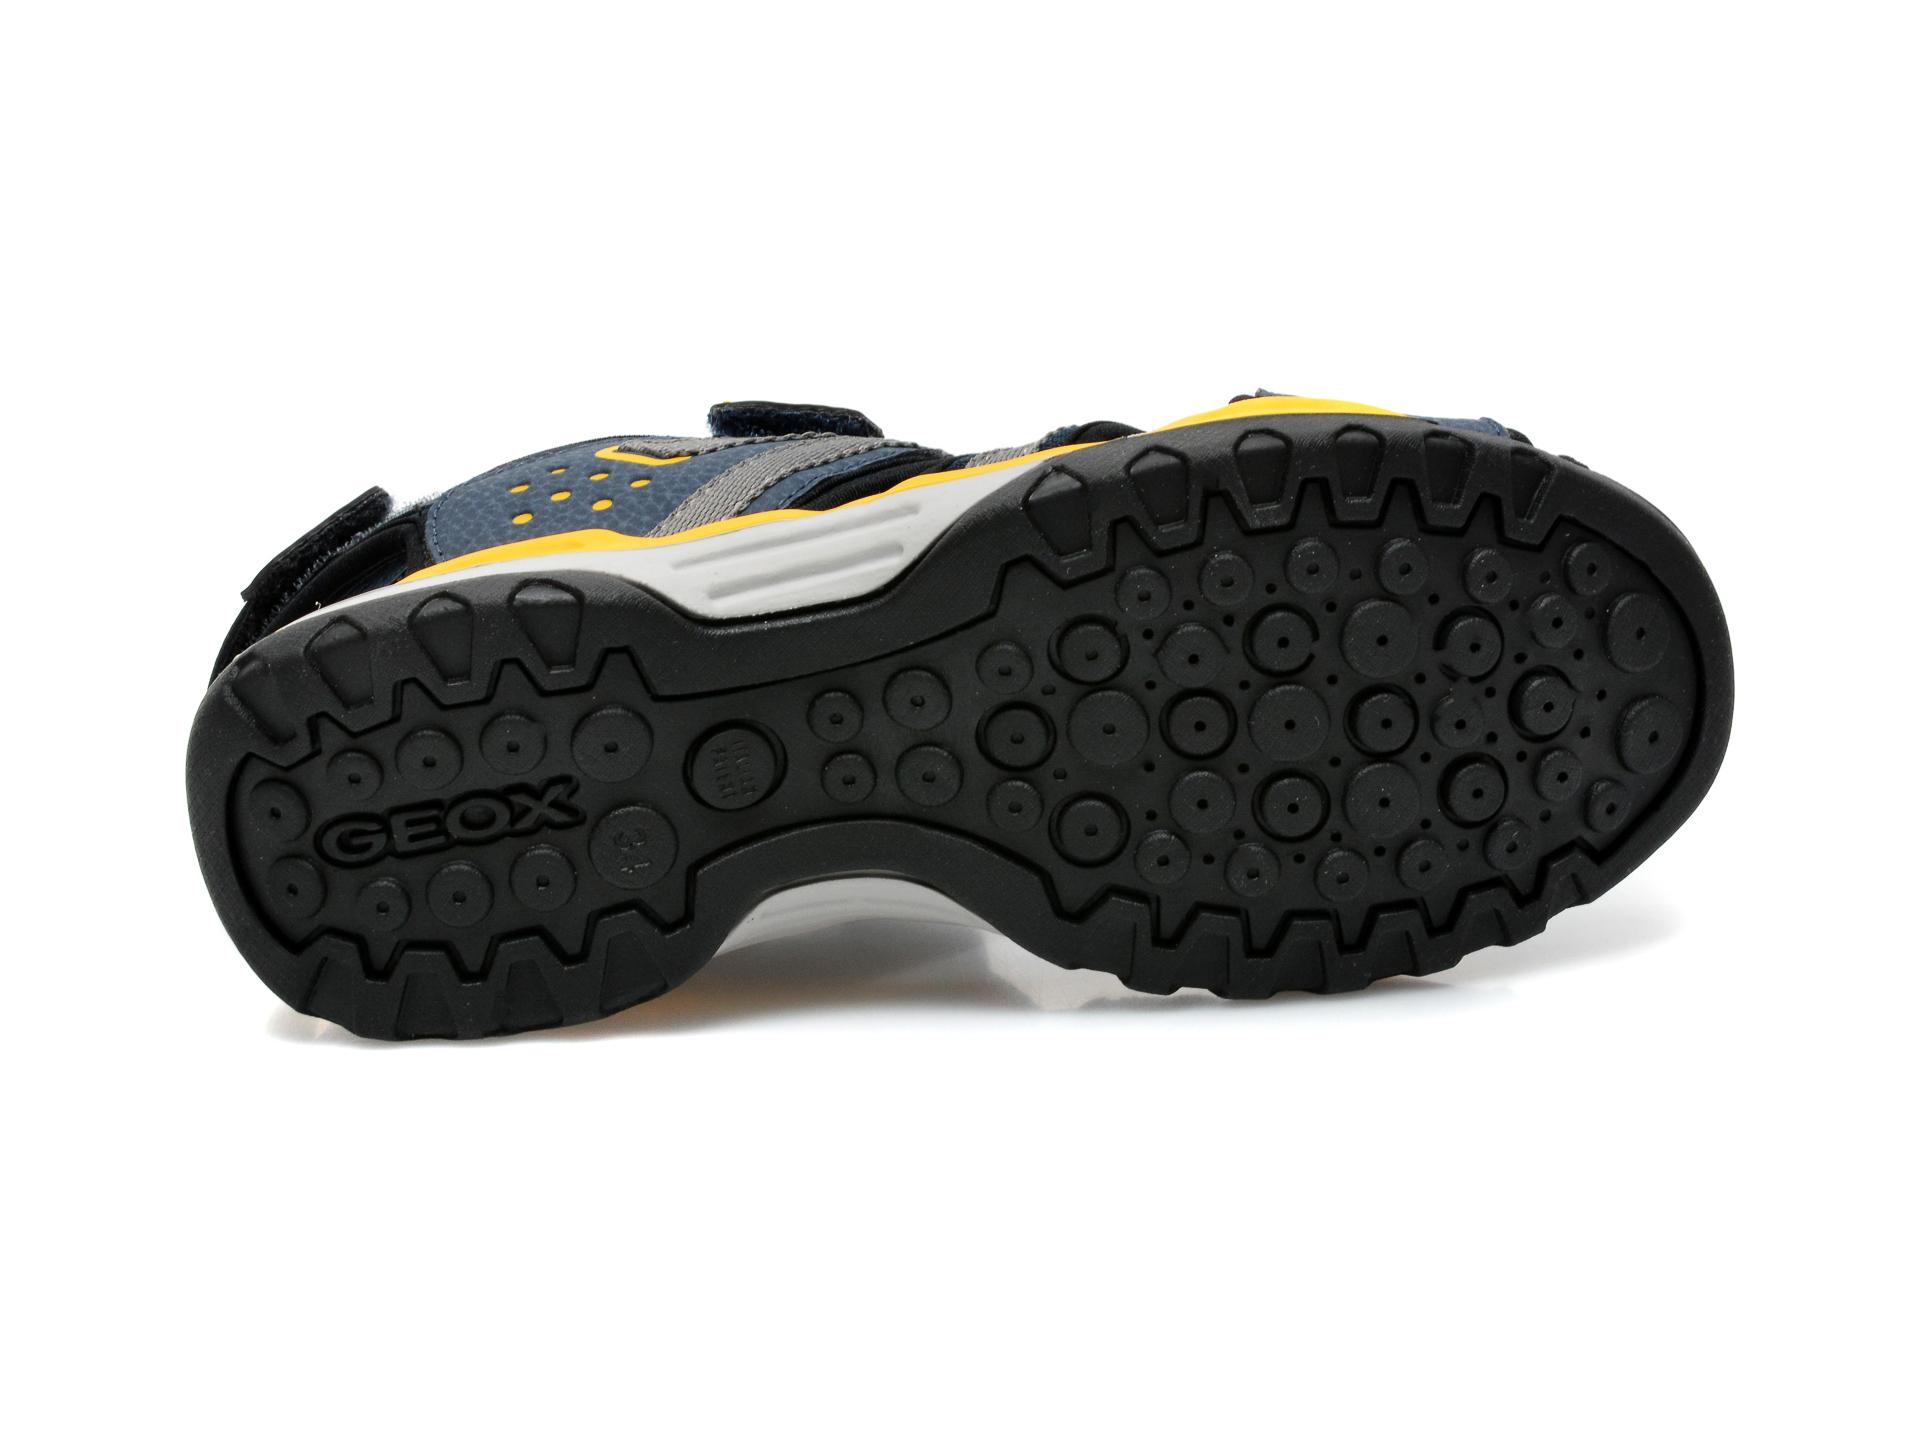 Sandale GEOX bleumarin, J920RB, din material textil si piele ecologica - 7